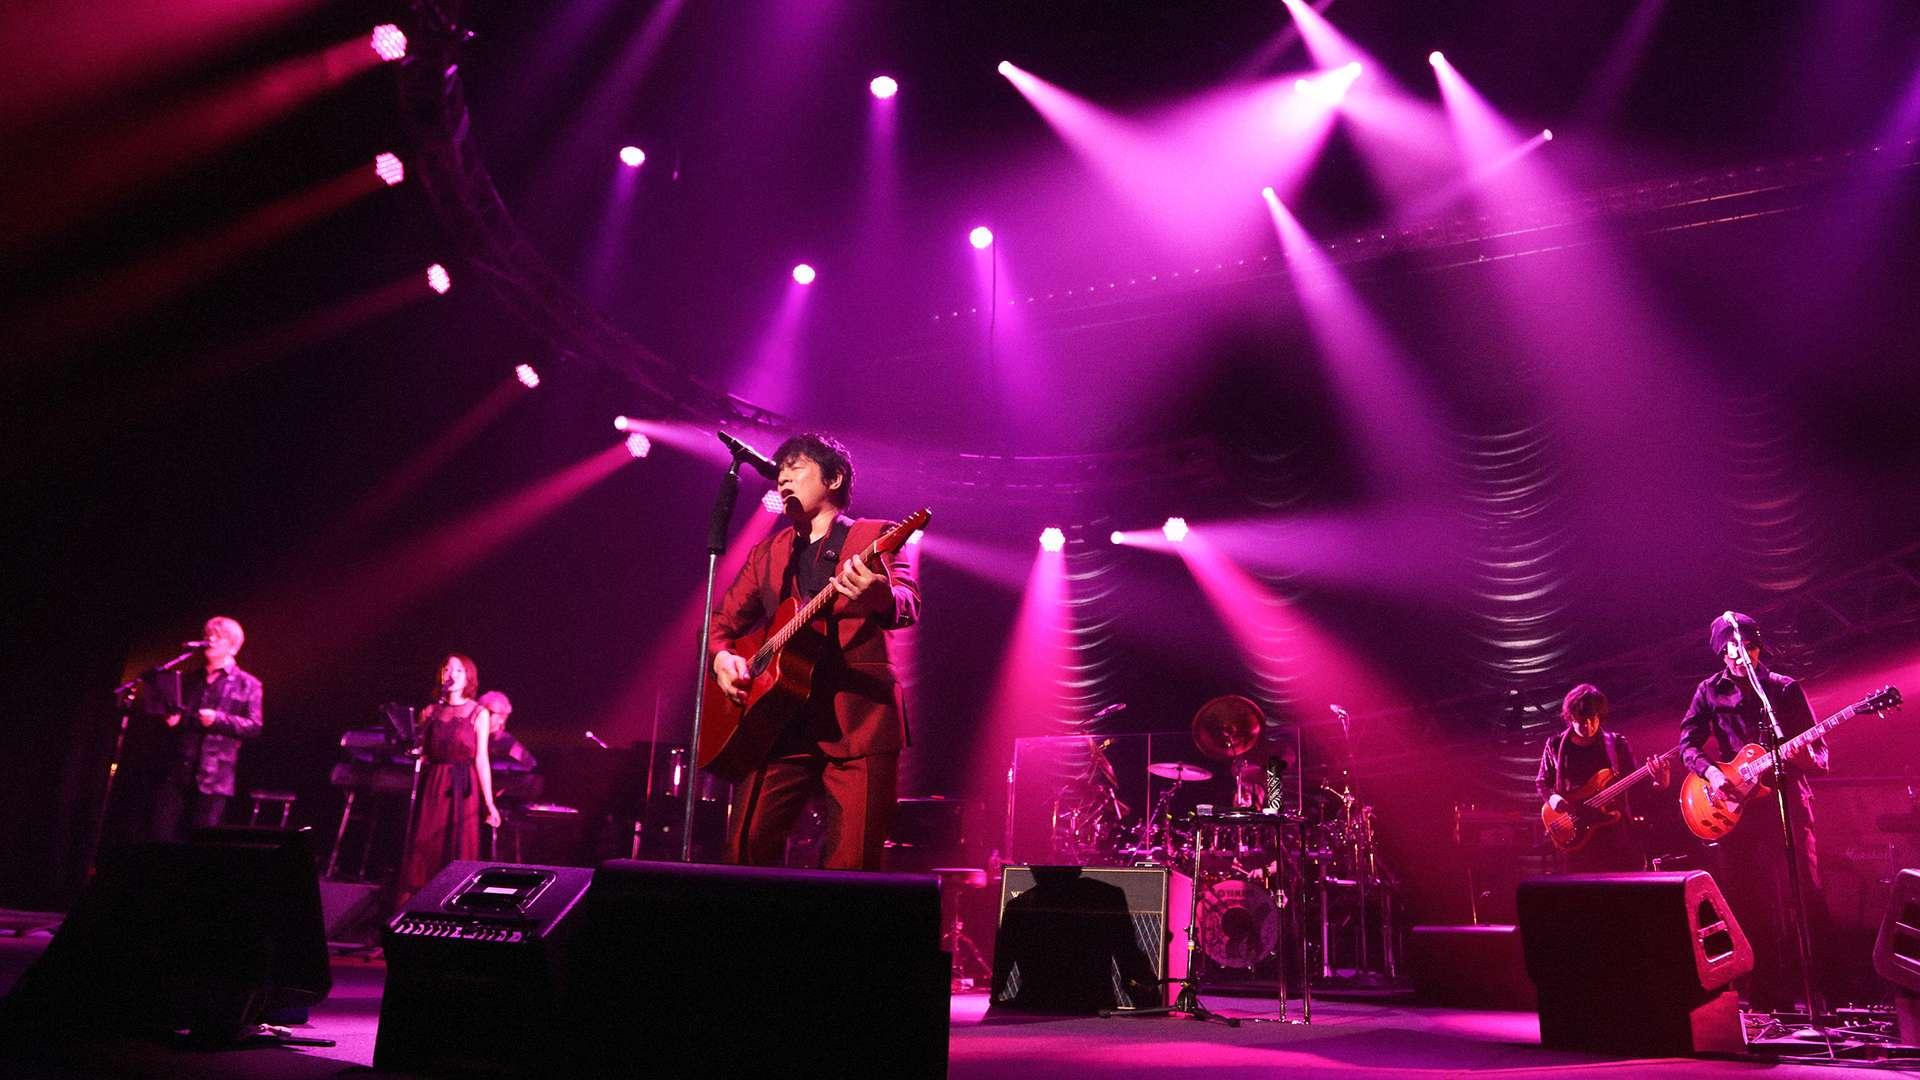 「ASKA CONCERT TOUR 2019 Made in ASKA -40年のありったけ- in 日本武道館」